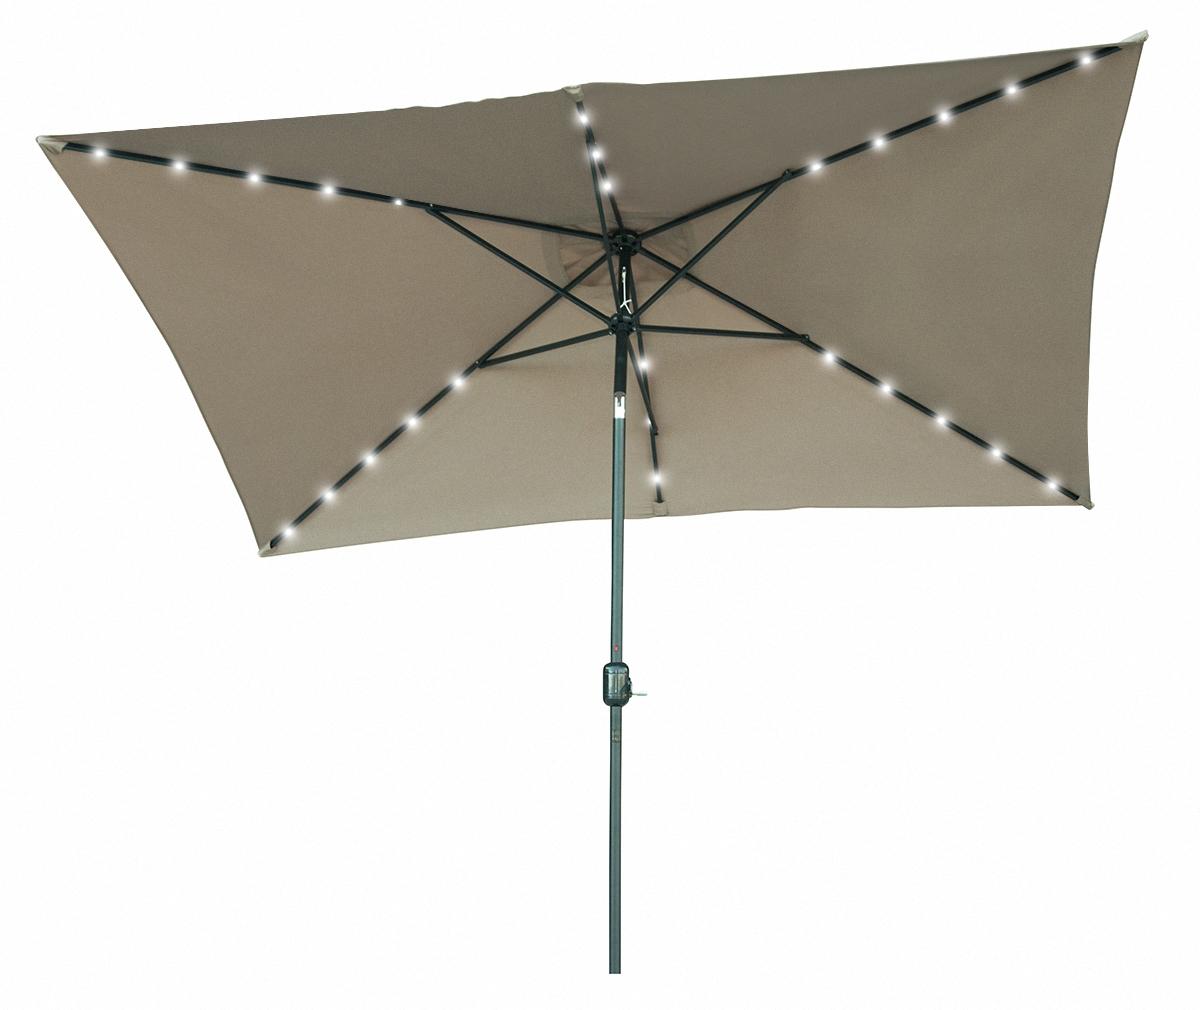 10 39 x 6 5 39 rectangular solar powered led lighted patio umbrella by. Black Bedroom Furniture Sets. Home Design Ideas